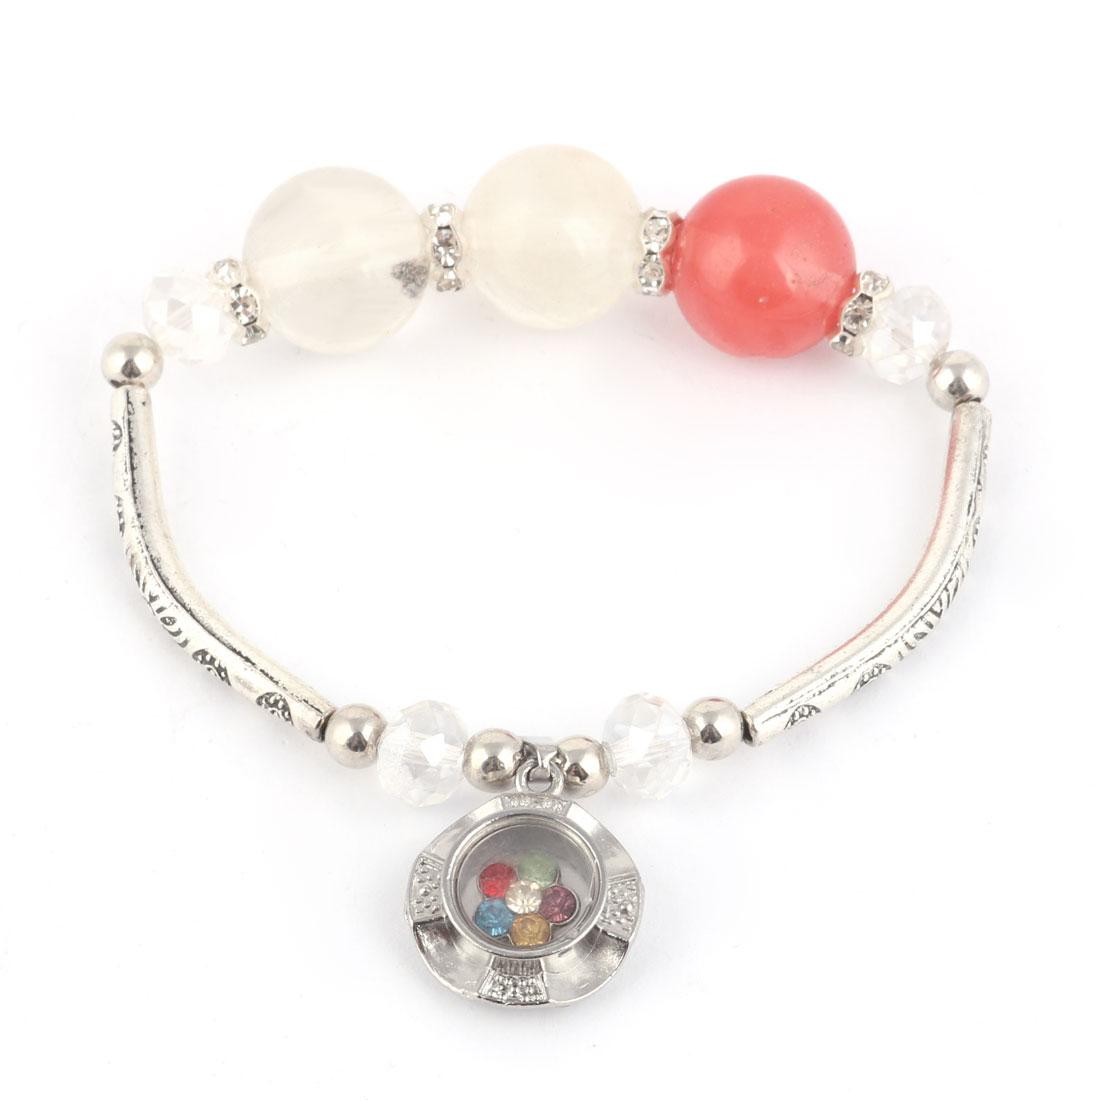 Lady Party Rhinestone Decor Pendant Wrist Bracelet Beads Bangle 14mm Dia